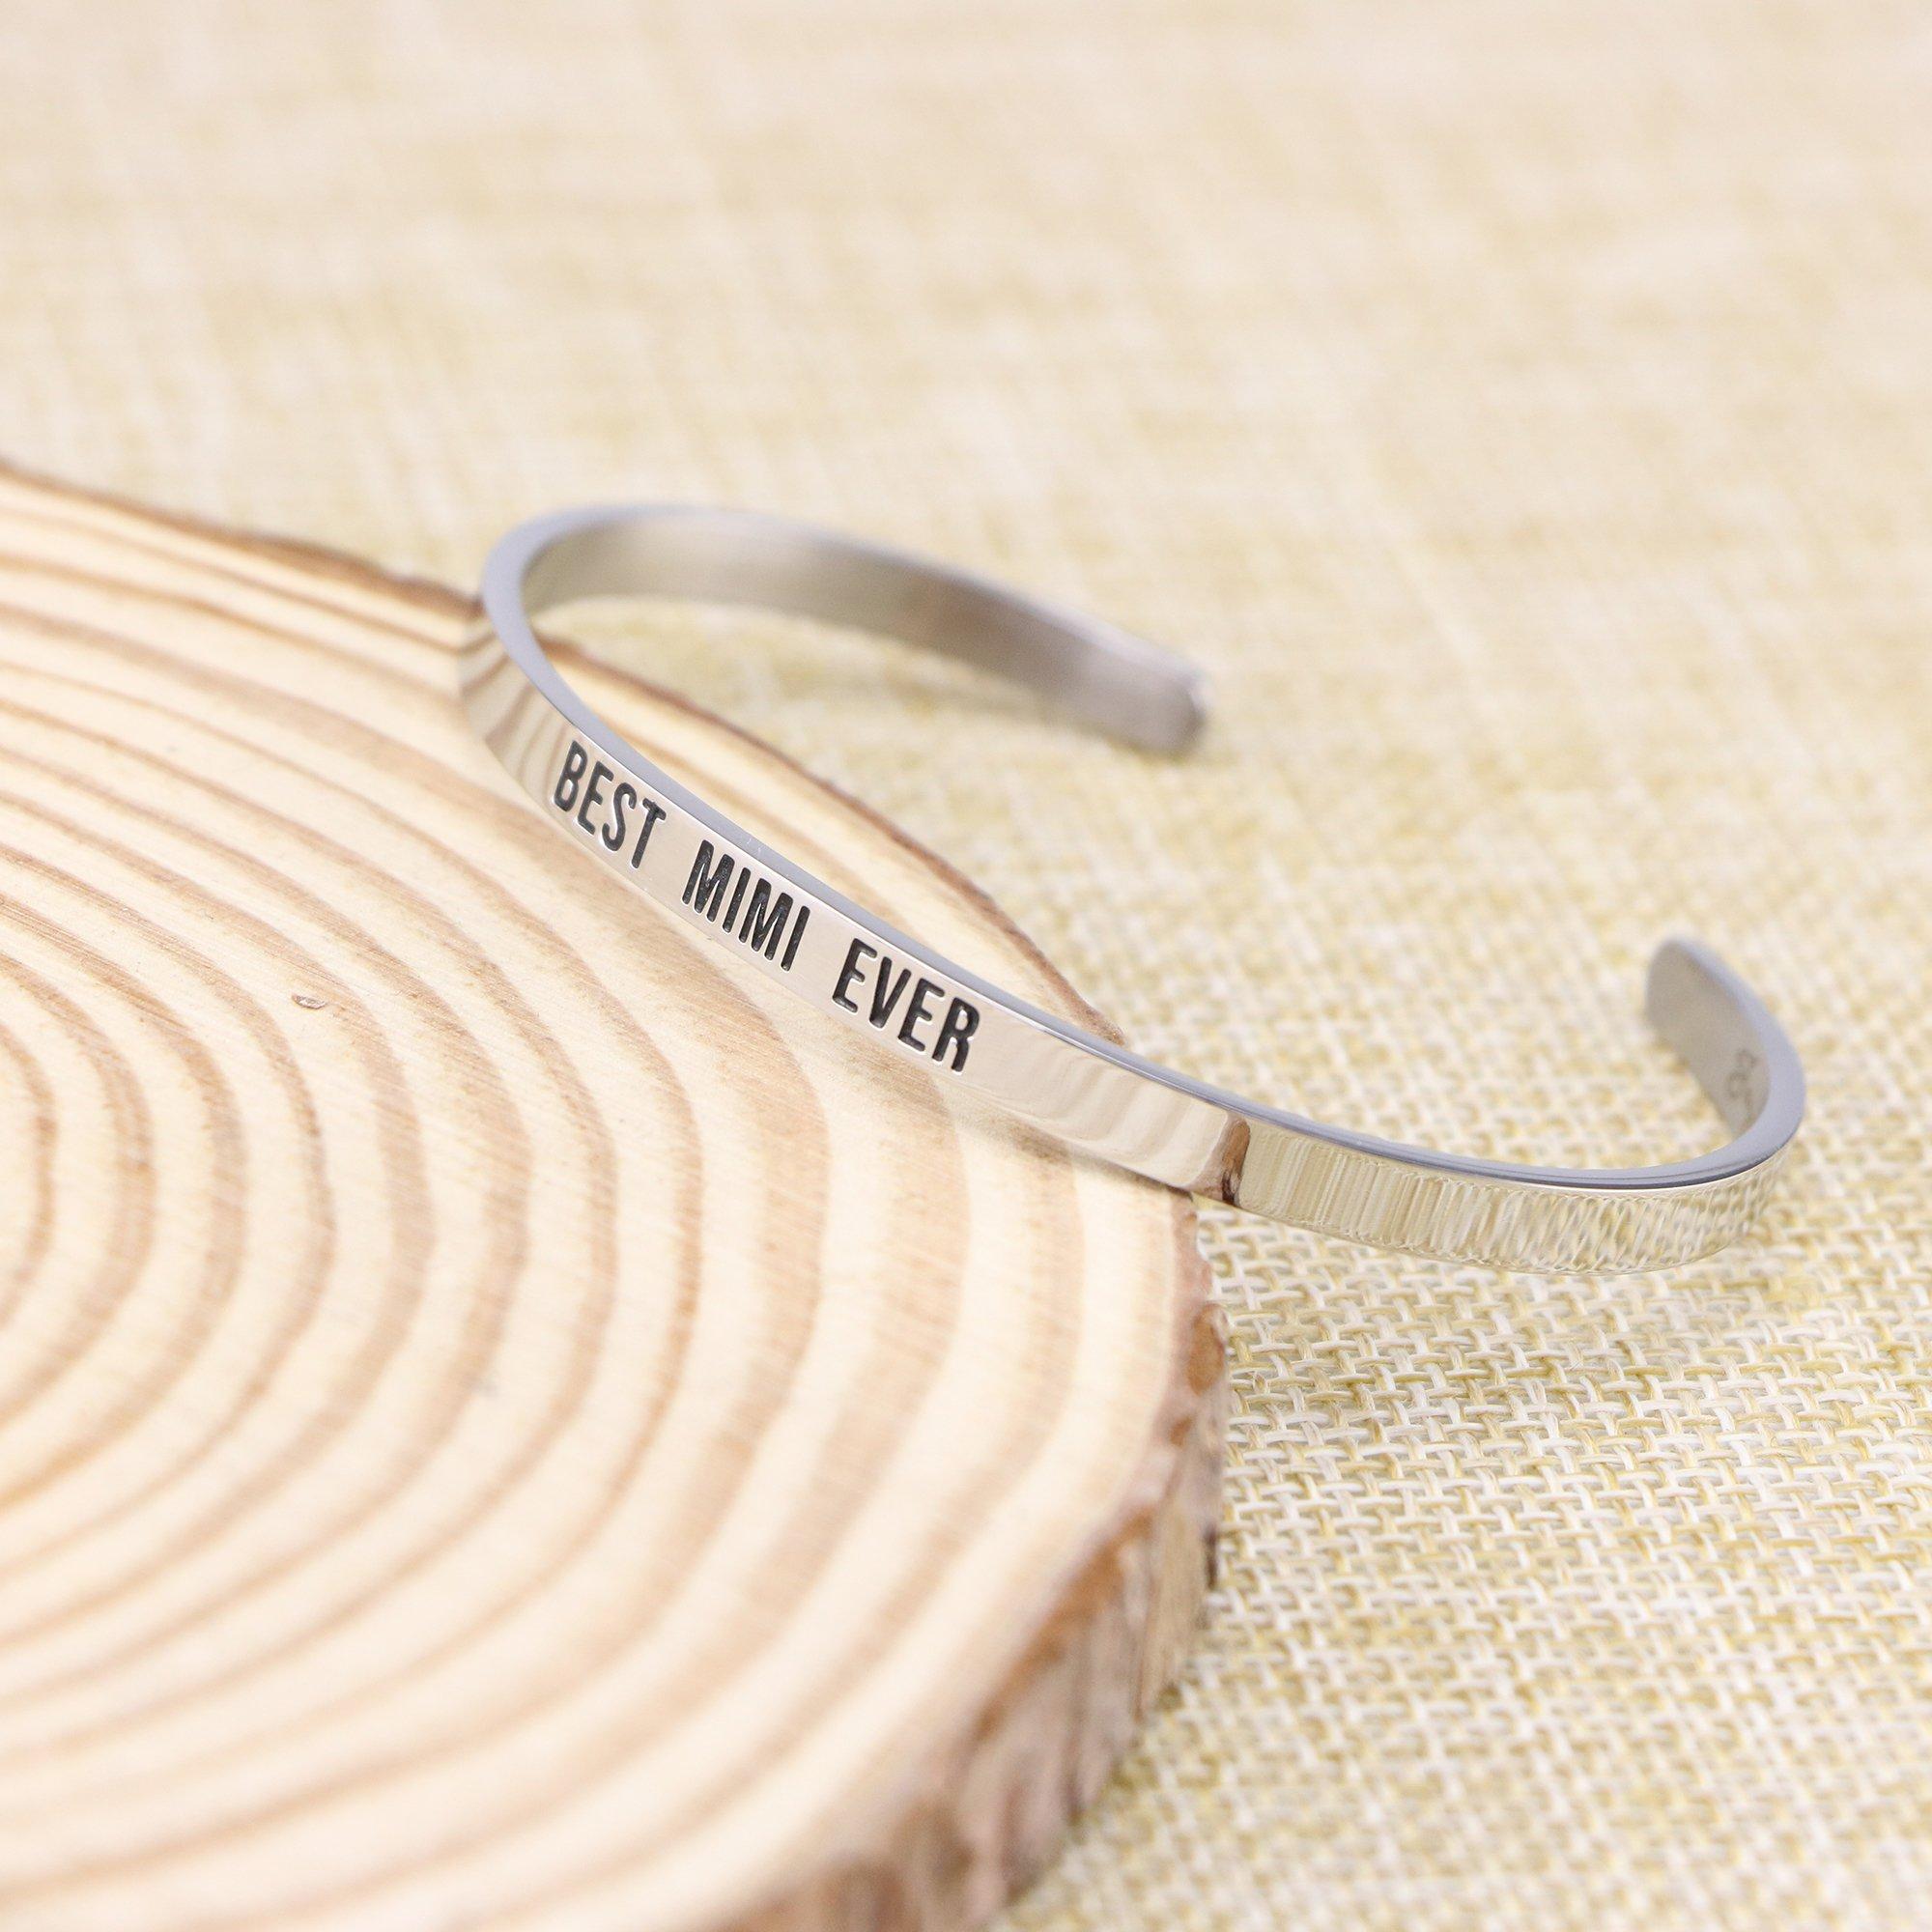 Joycuff Best Mimi Ever Bracelet Jewelry Gifts for Grandma Mantra Cuff Bracelets Bangle by Joycuff (Image #3)